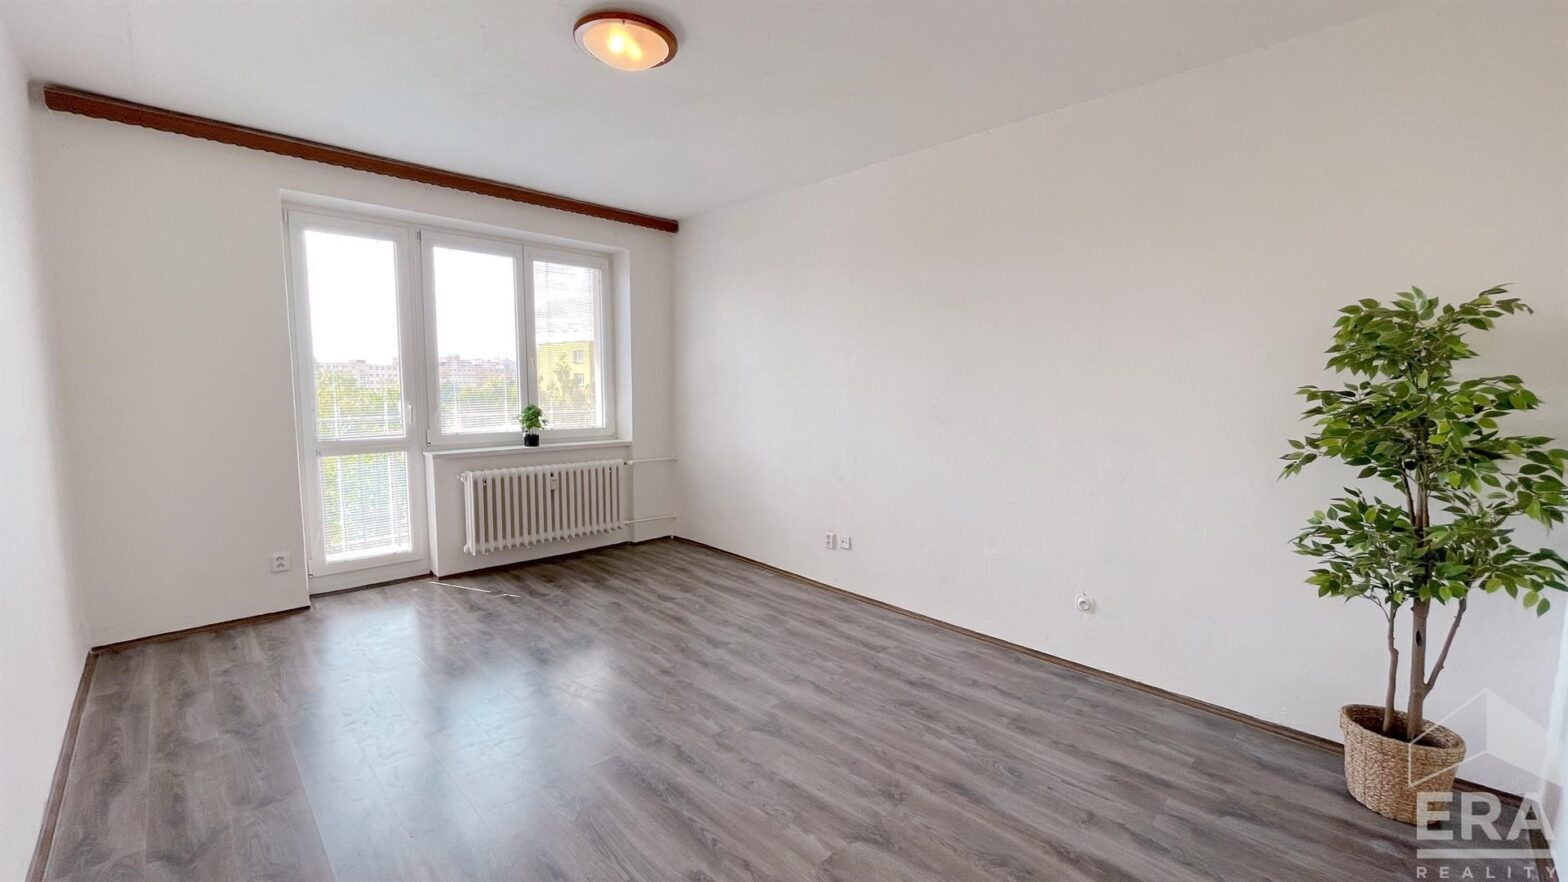 Pronájem bytu 2+1 s balkonem, Ostrava Poruba